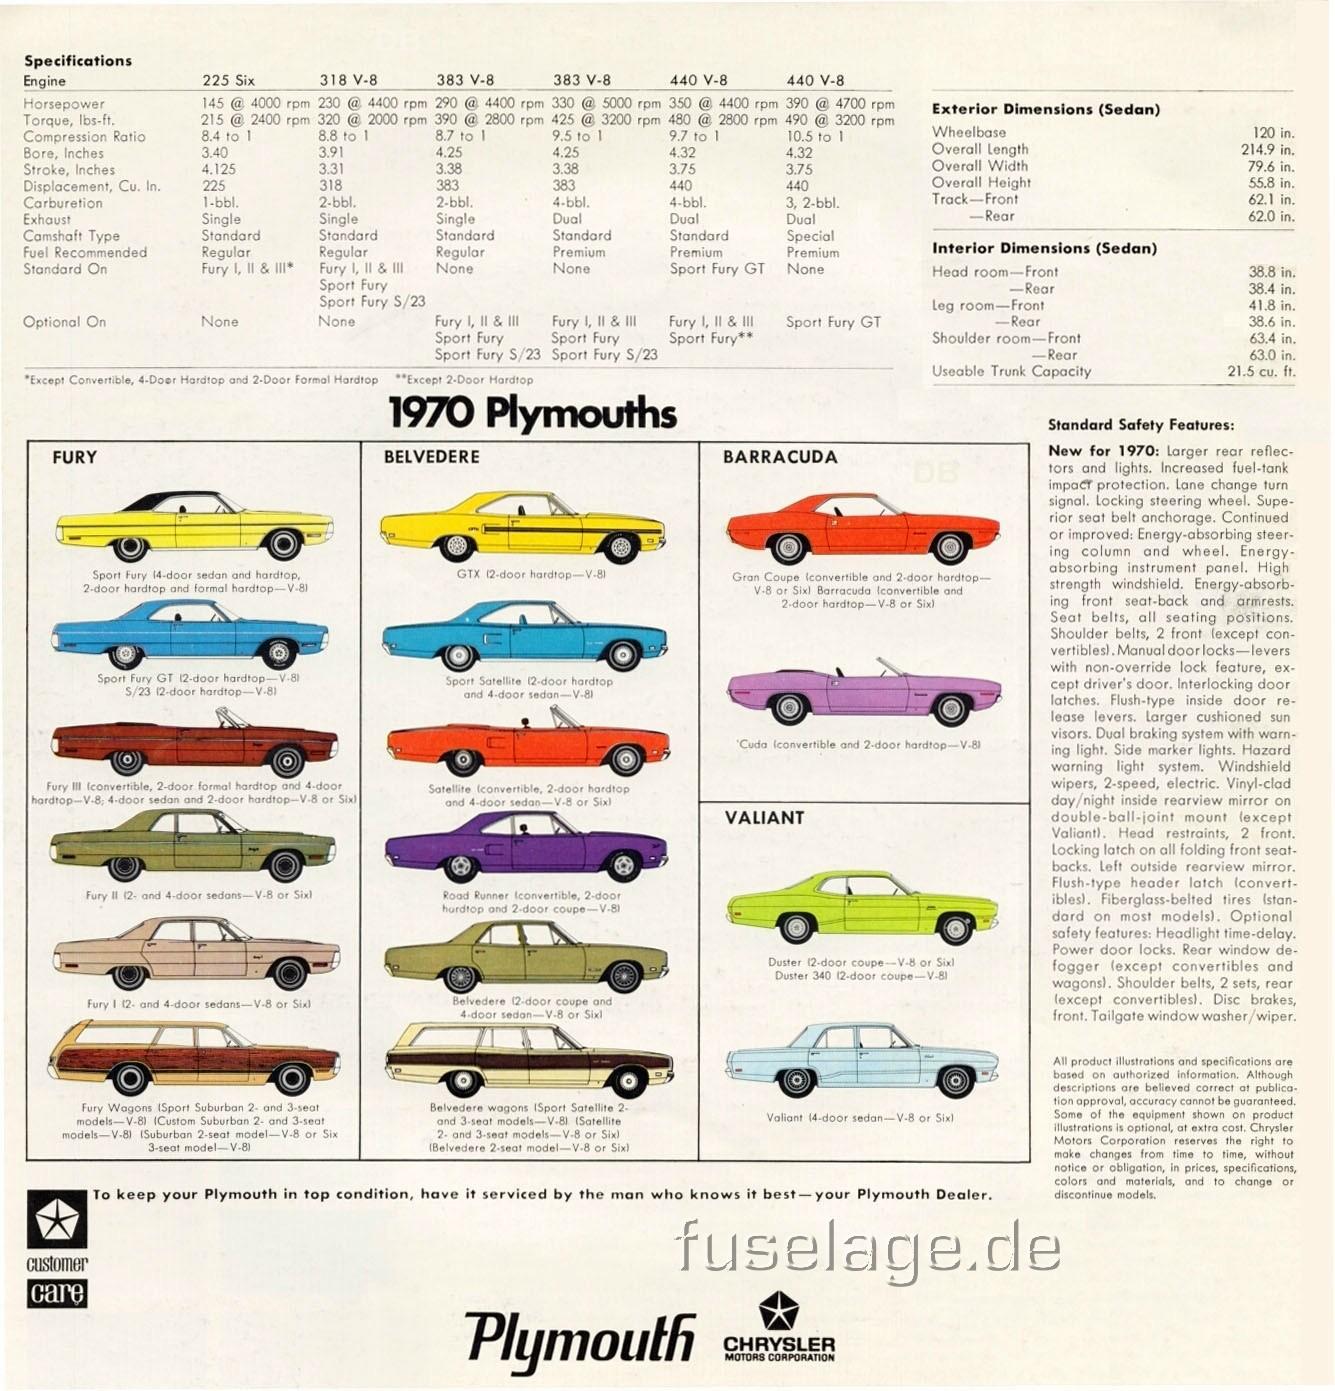 IMCDb.org: 1970 Plymouth Fury